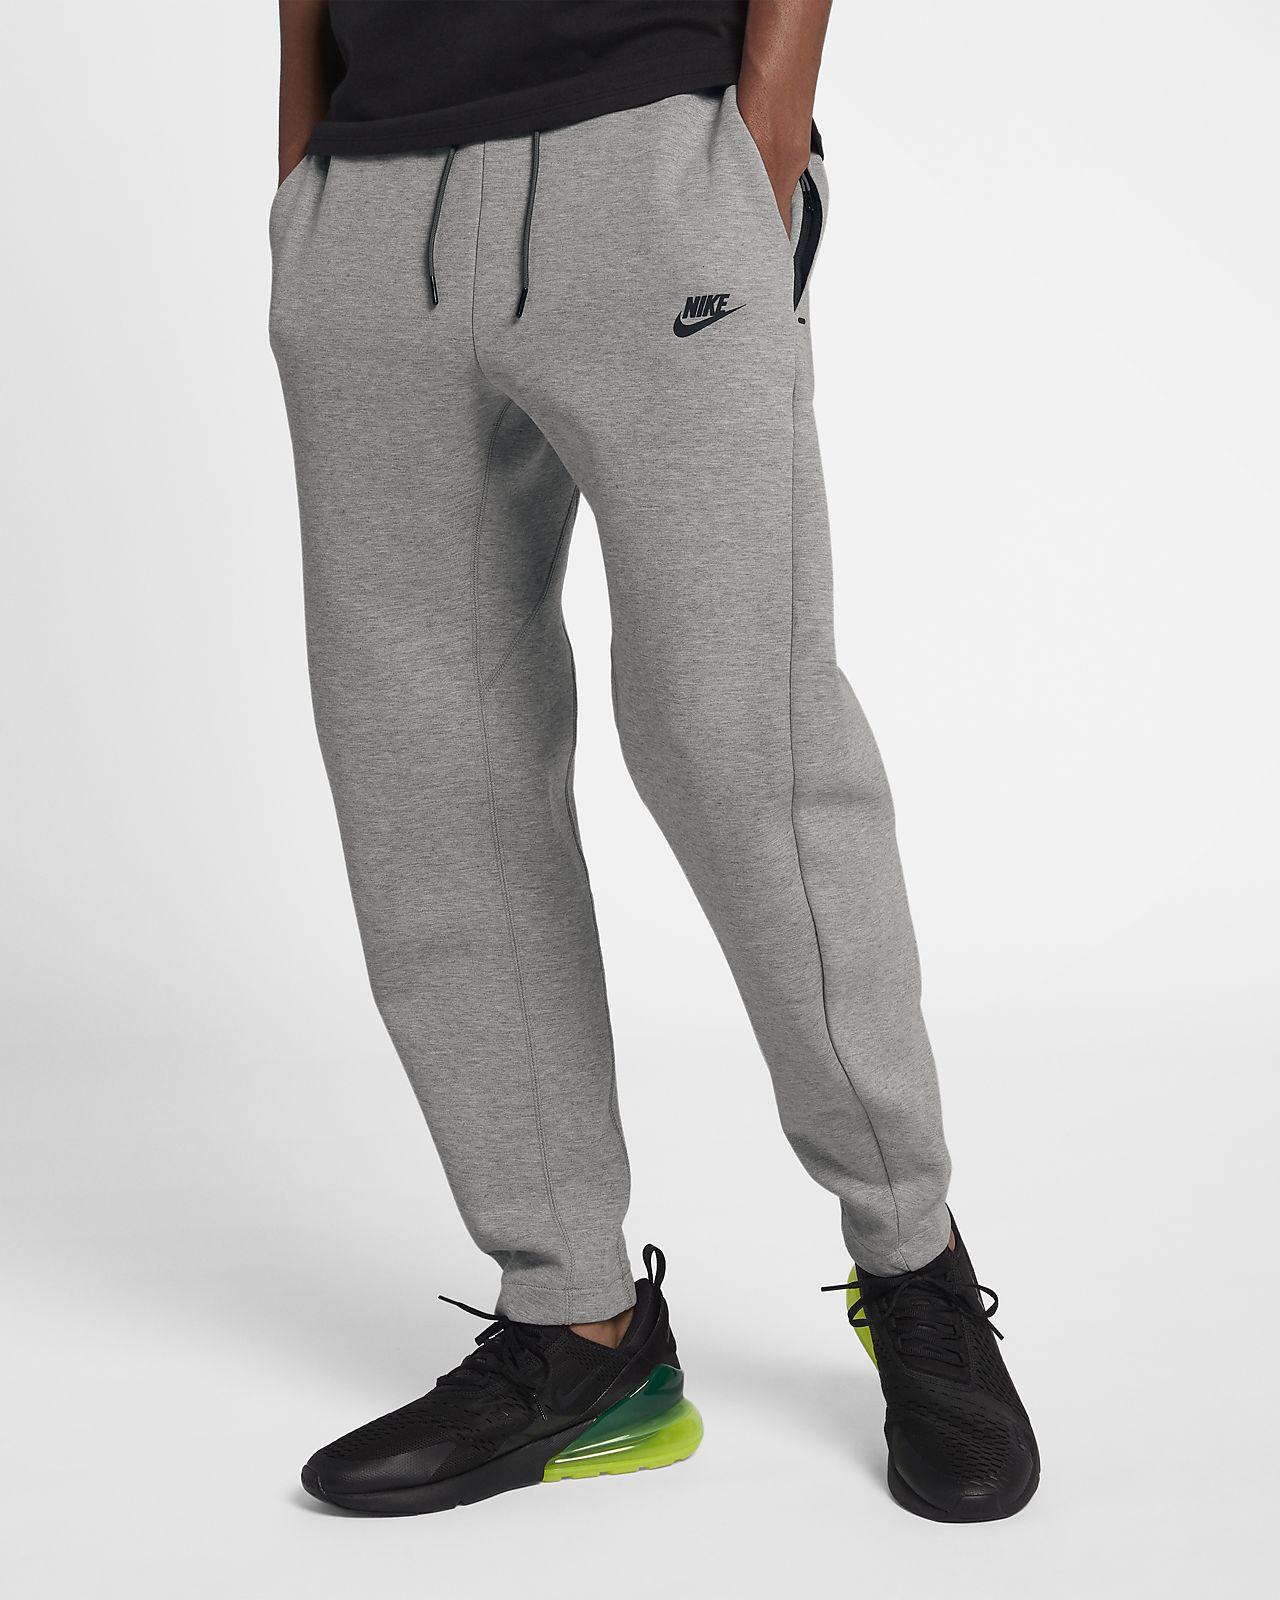 Pantaloni jogger Nike Sportswear Tech Fleece Uomo